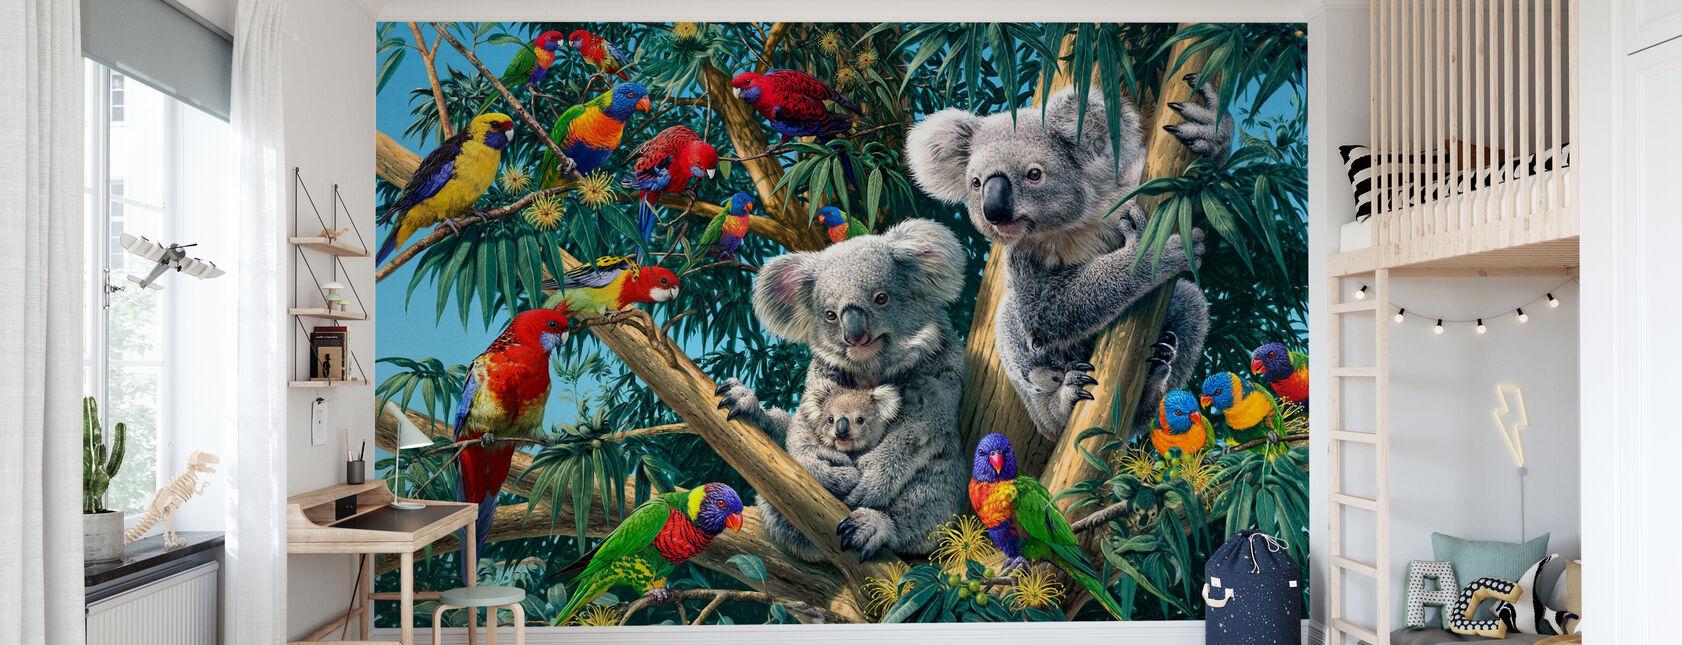 Koala Outback - Wallpaper - Kids Room